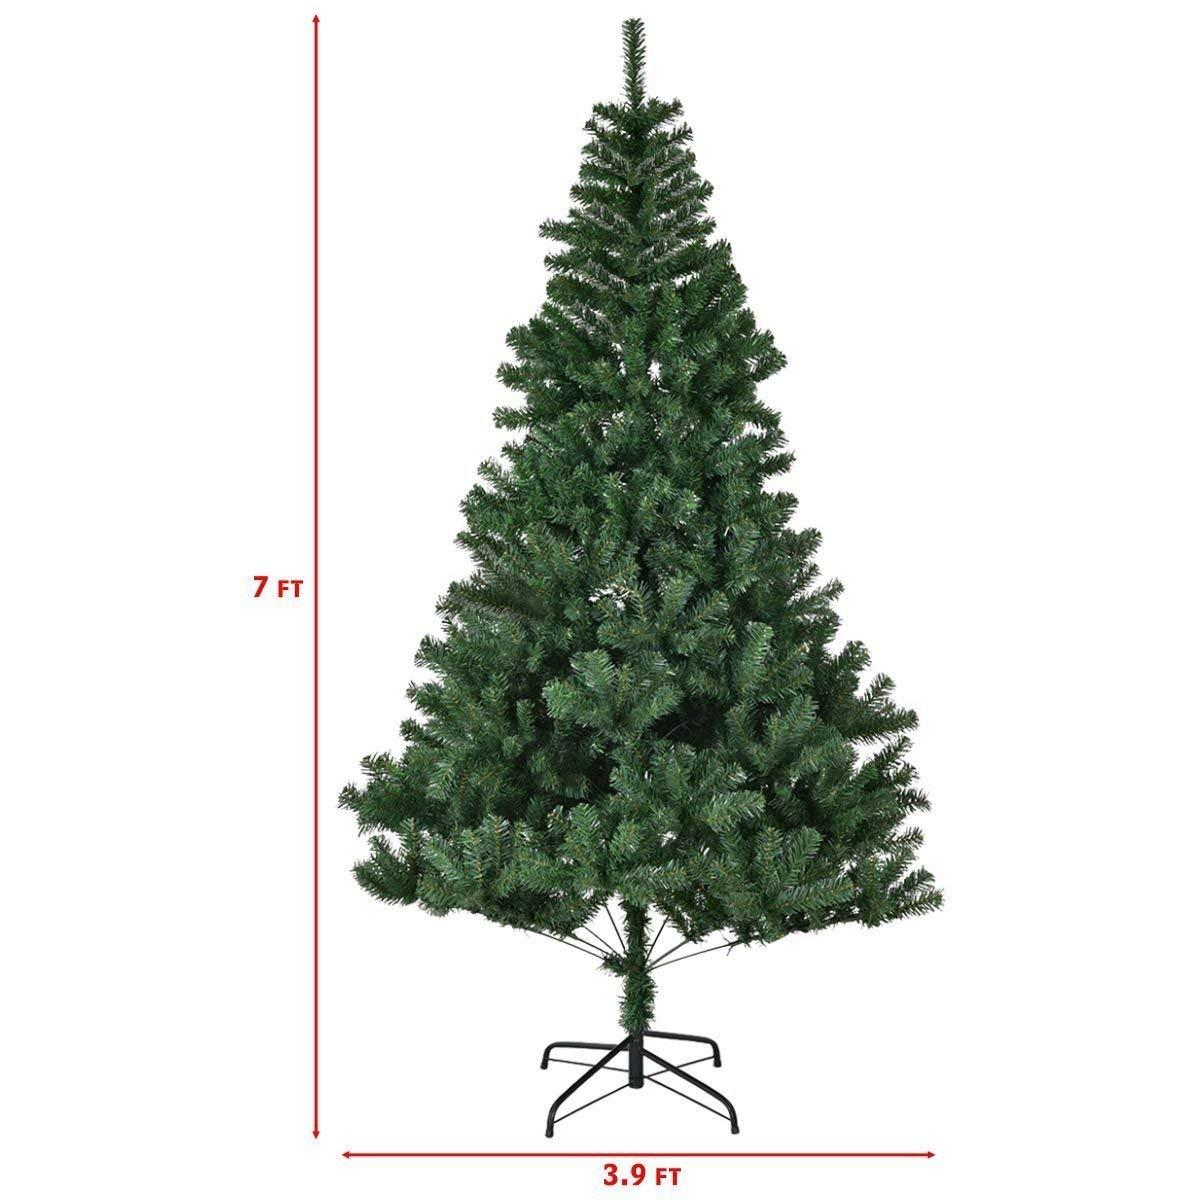 Amazon.com: Goplus 7ft Christmas Tree Artificial Unlit Premium ...